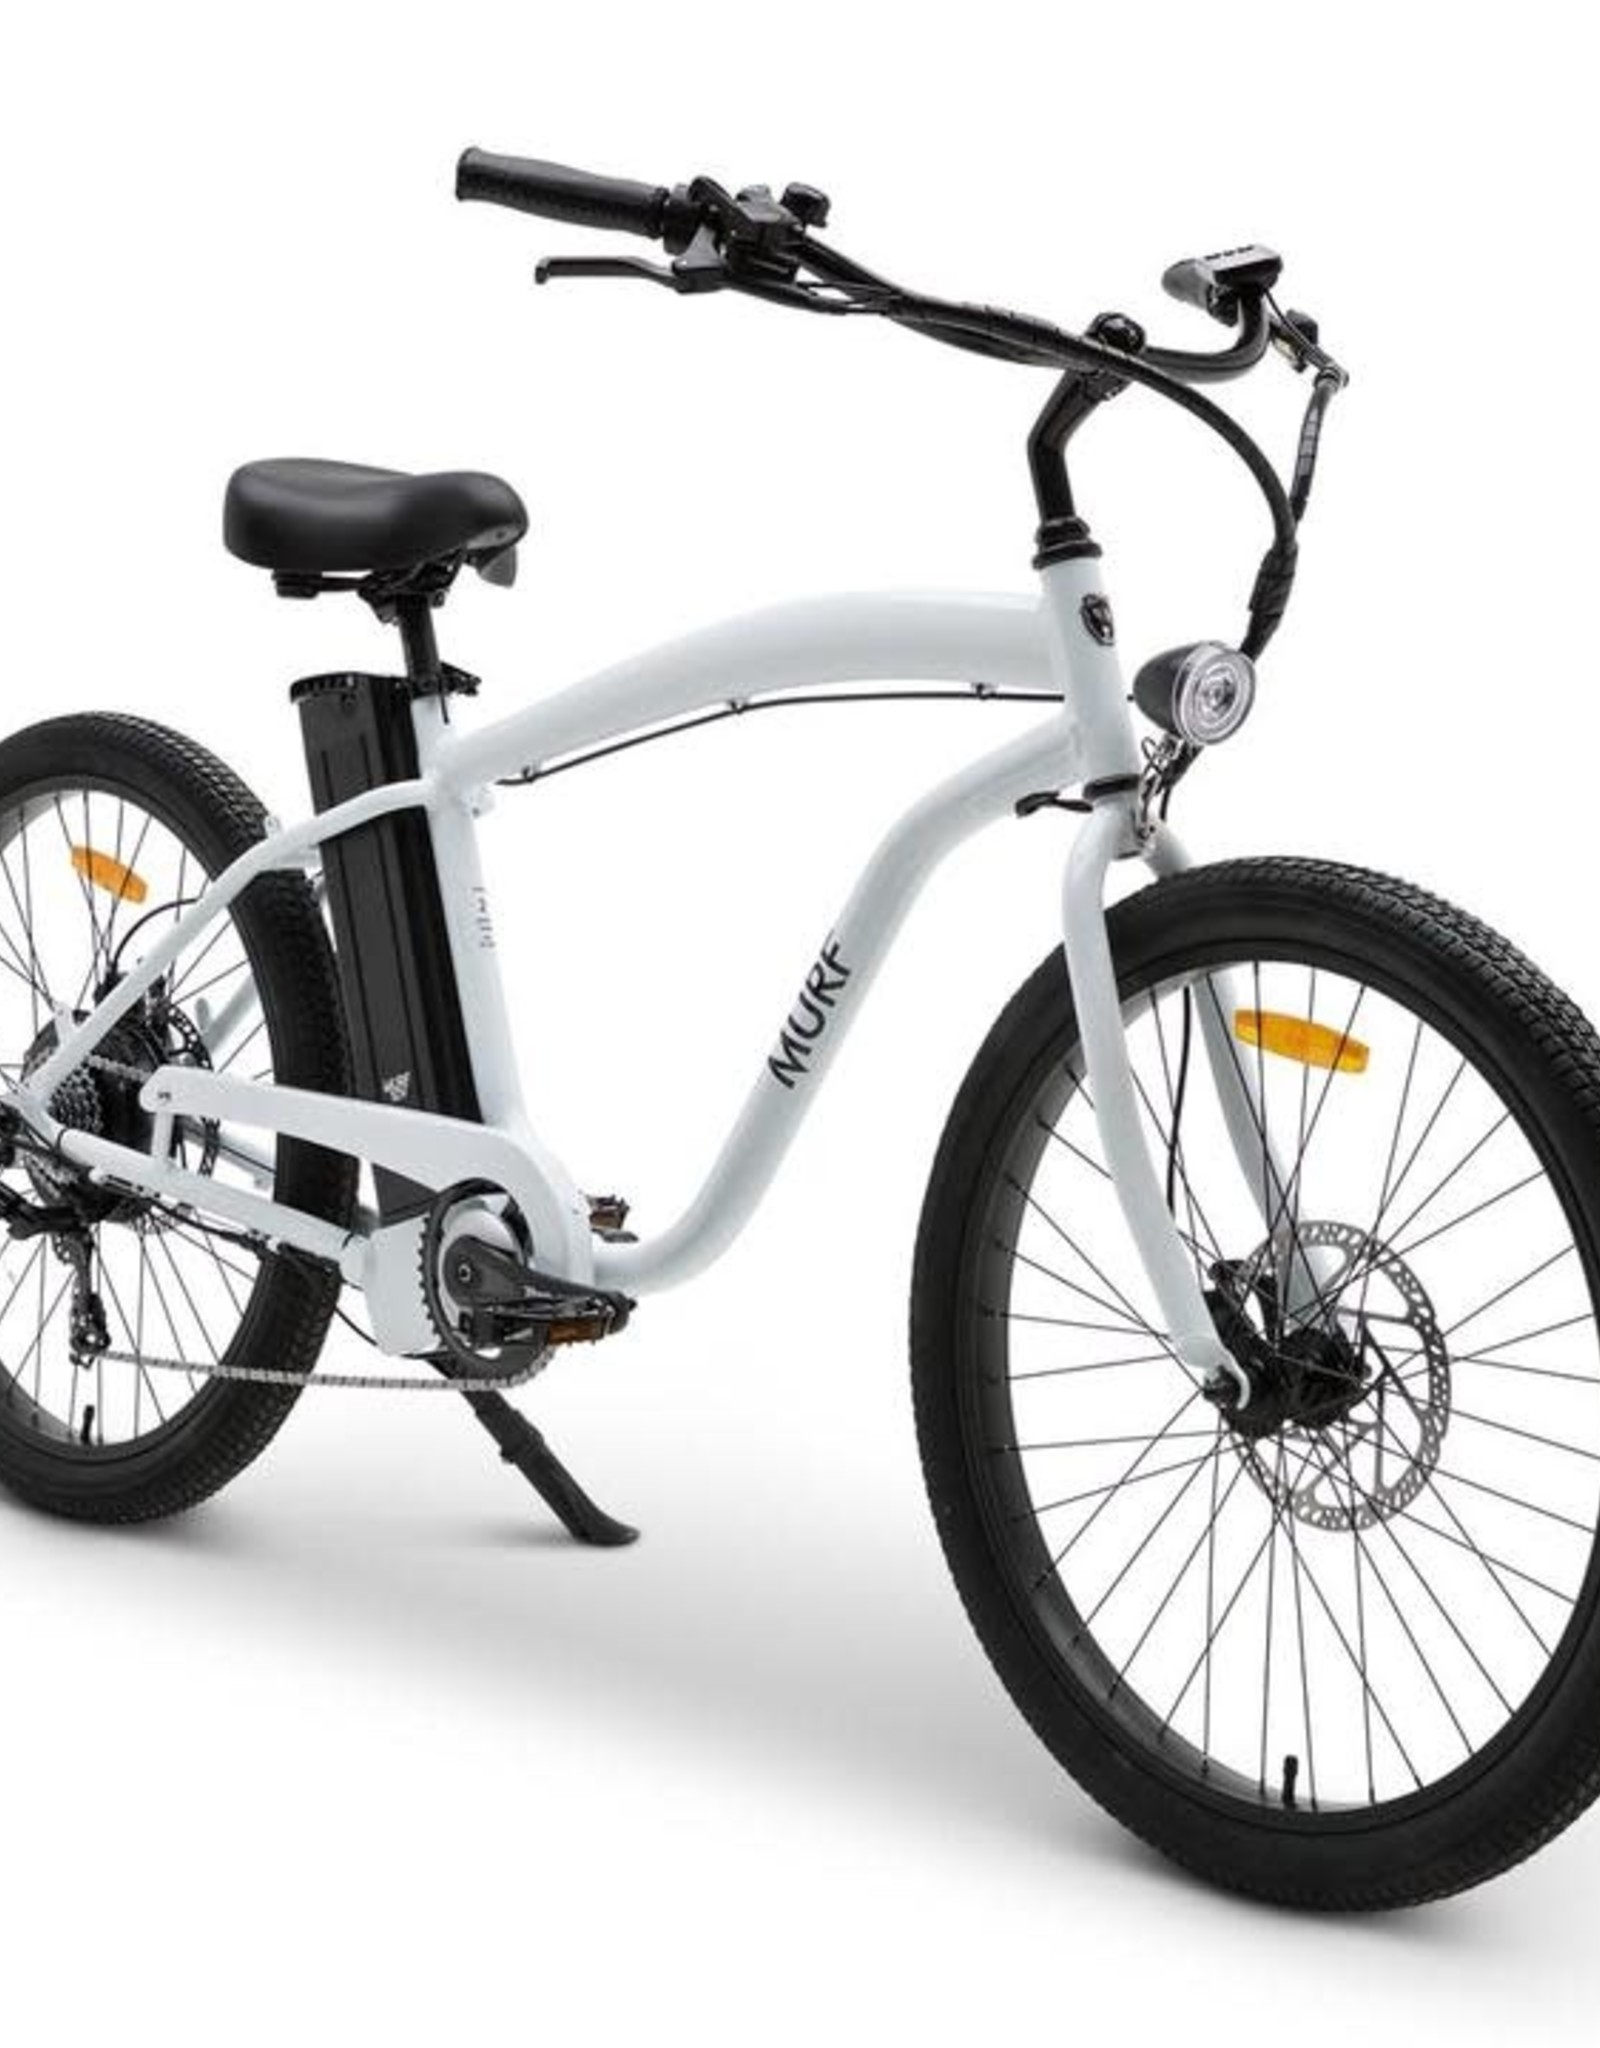 Murf Izzy Cruiser 52V E-Bike